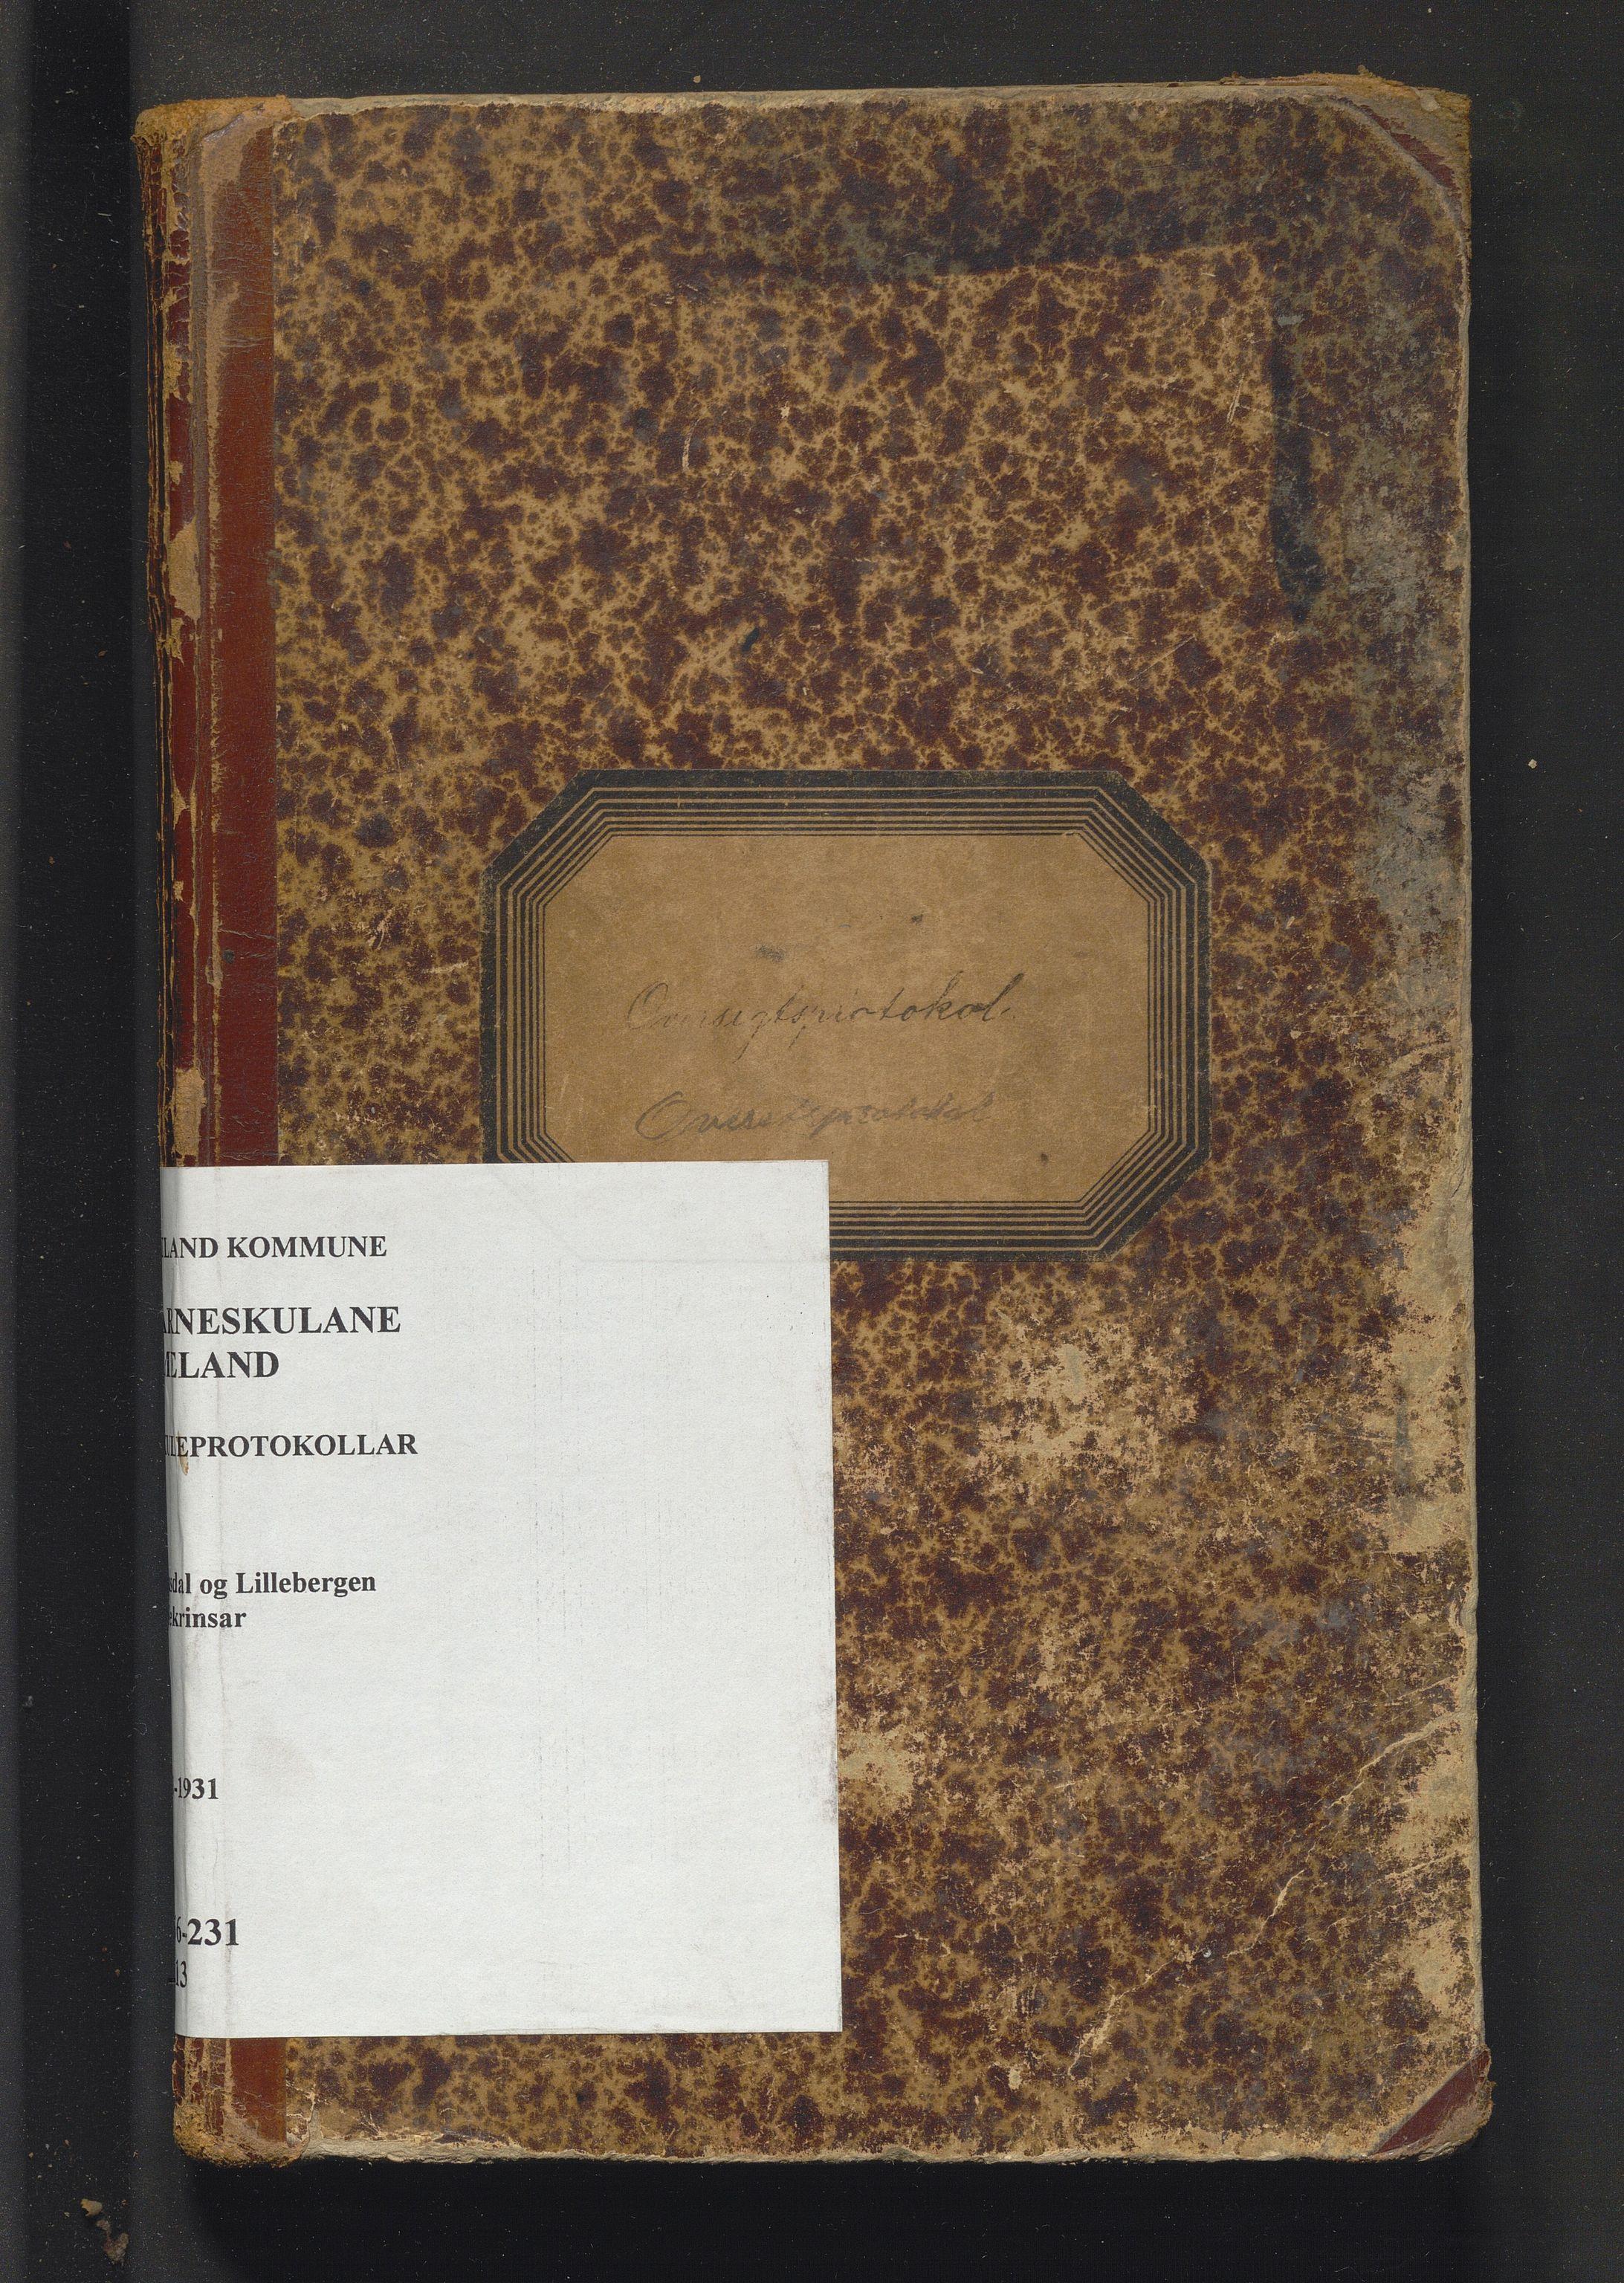 IKAH, Meland kommune. Barneskulane, F/Fa/L0013: Skuleprotokoll for Grasdal og Lillebergen krinsar, 1893-1931